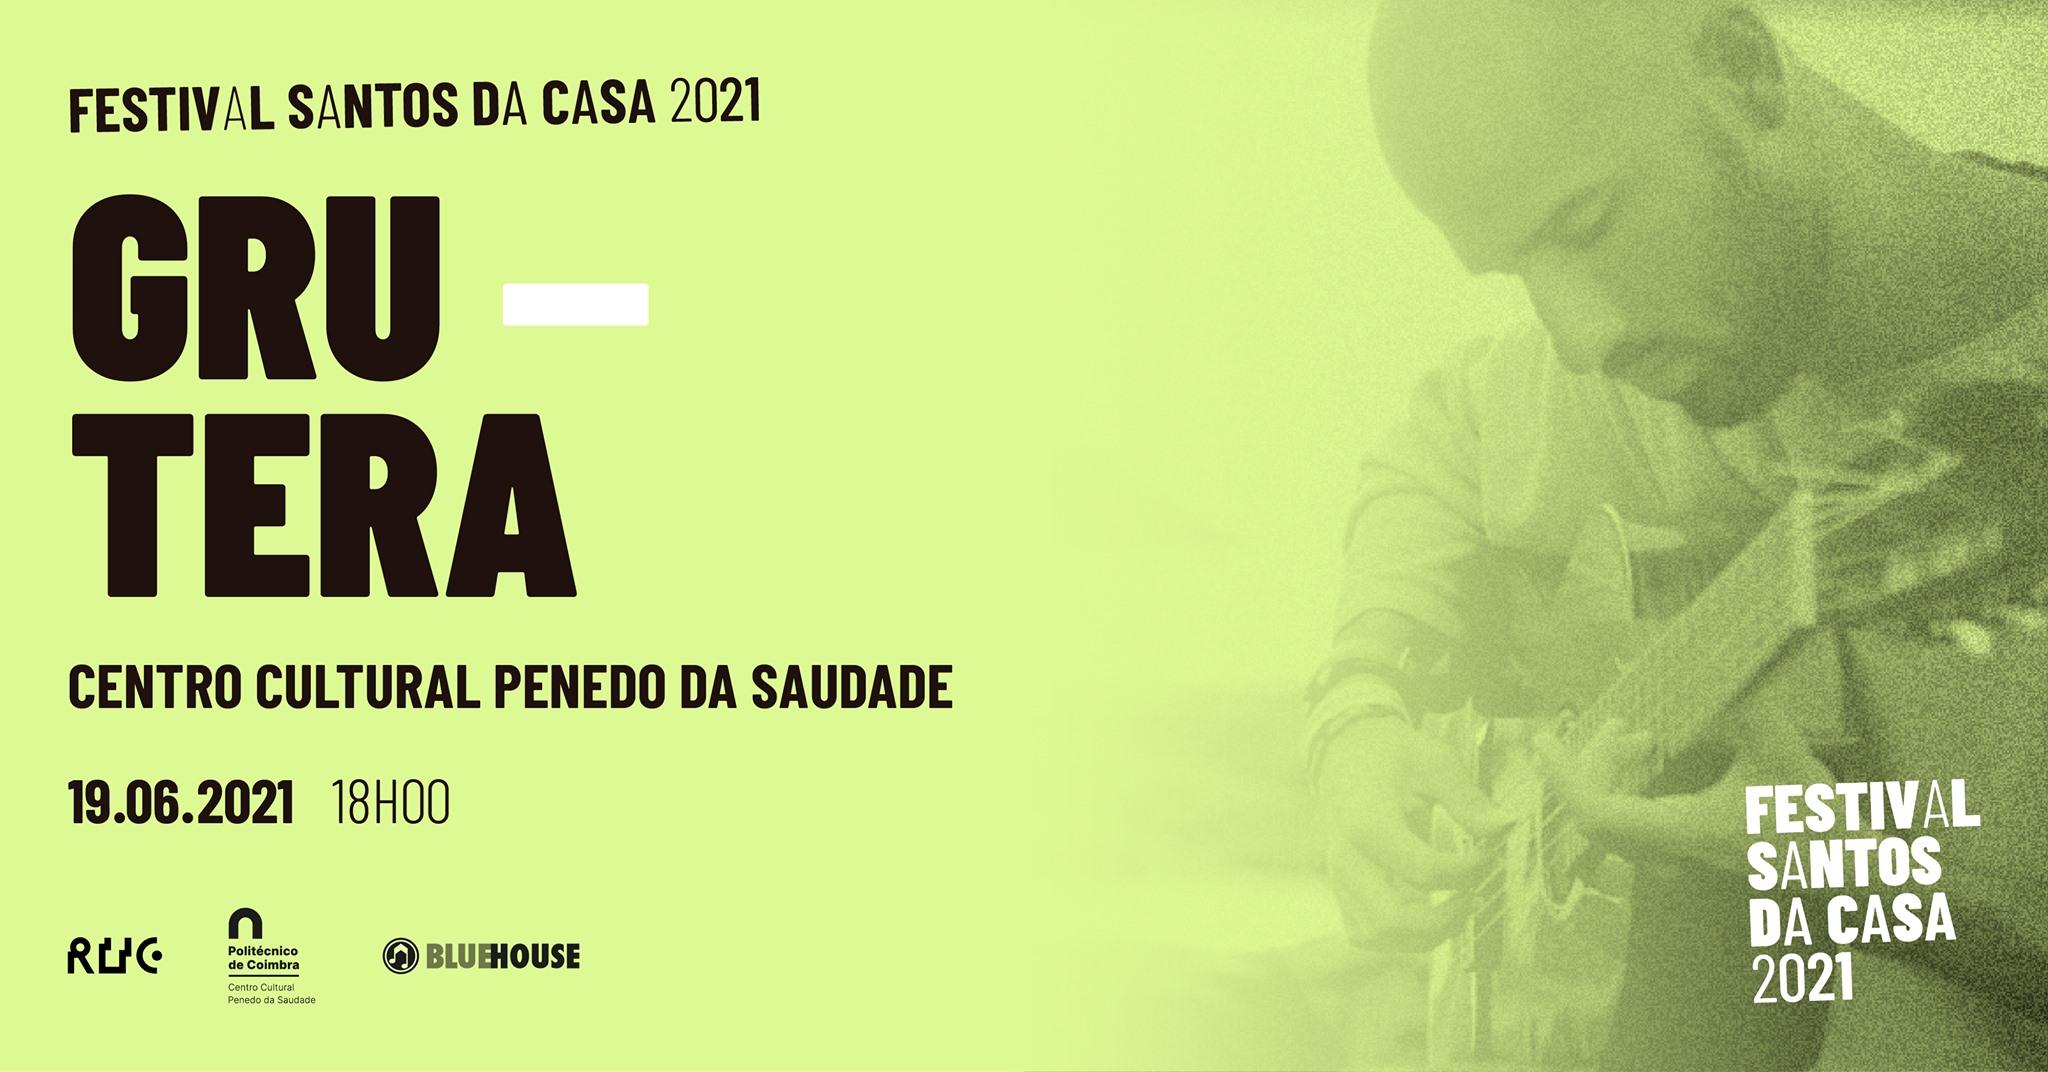 Grutera - C.C. Penedo da Saudade (FSdC20/21)